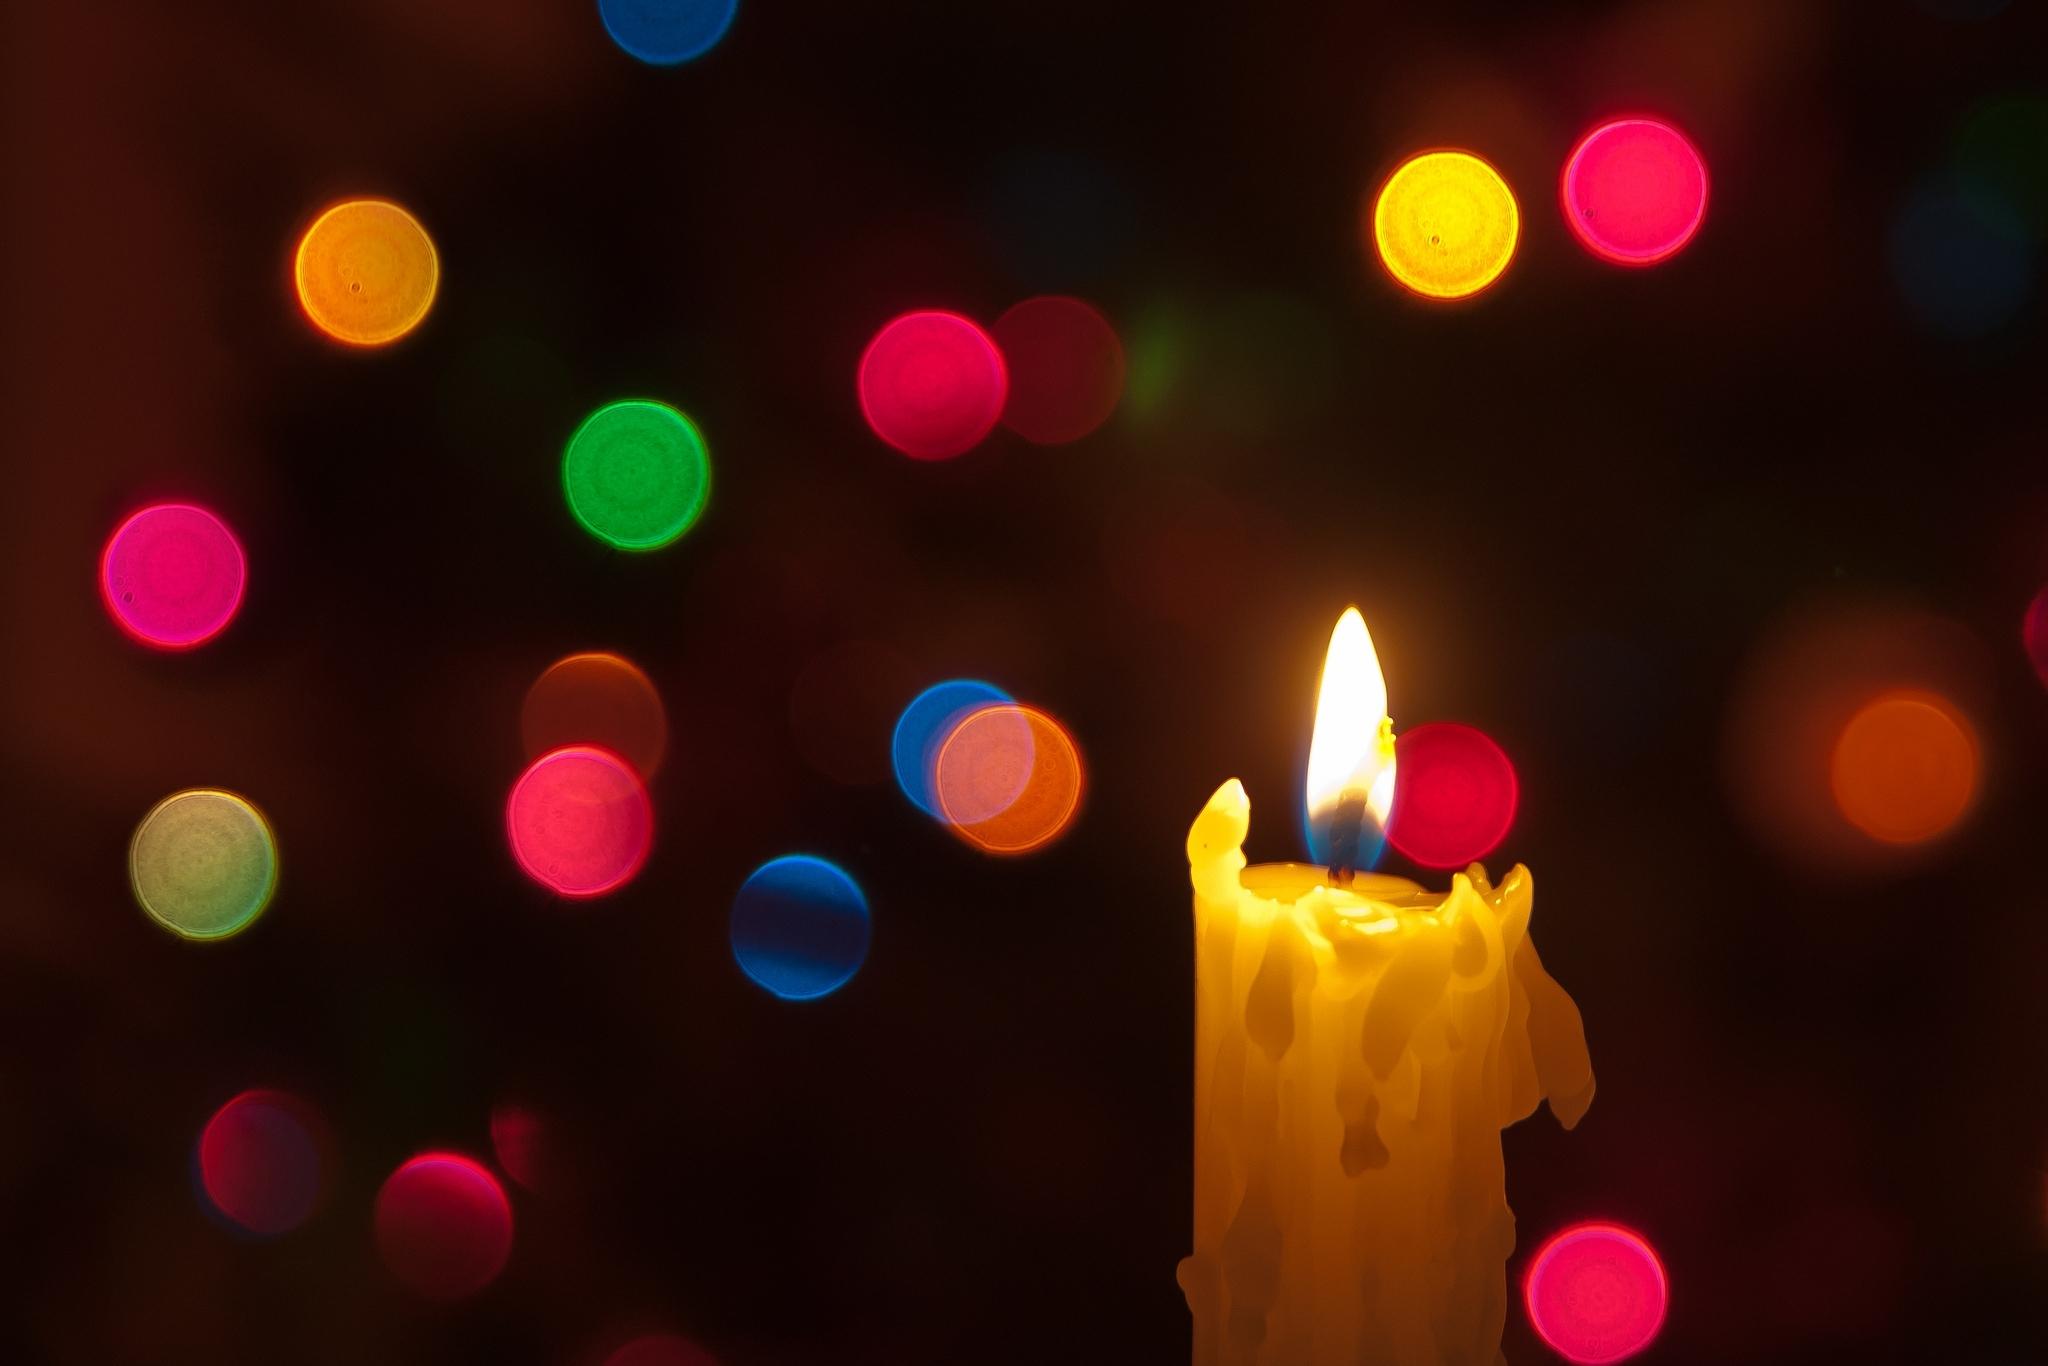 669321d53a8375ed2304_candle.JPG